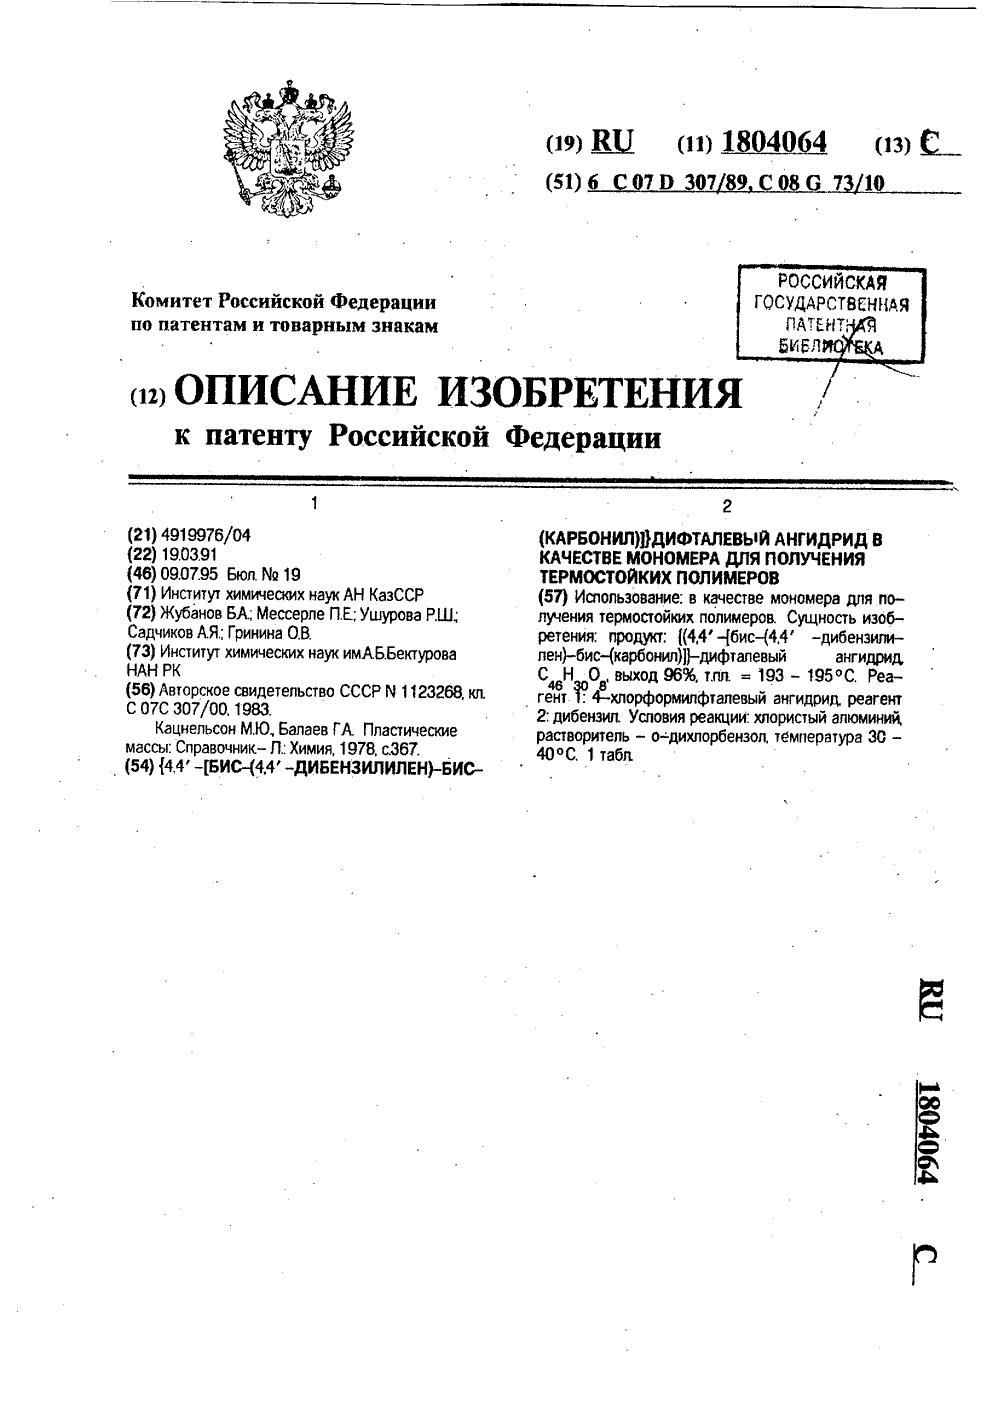 1-дихлор-2,2-бис(3-амино-4-хлорфенил)этилена и диангидрида бис 4-(о-дикарбоксифенокси)фенил ацетилена с 3b7прив=